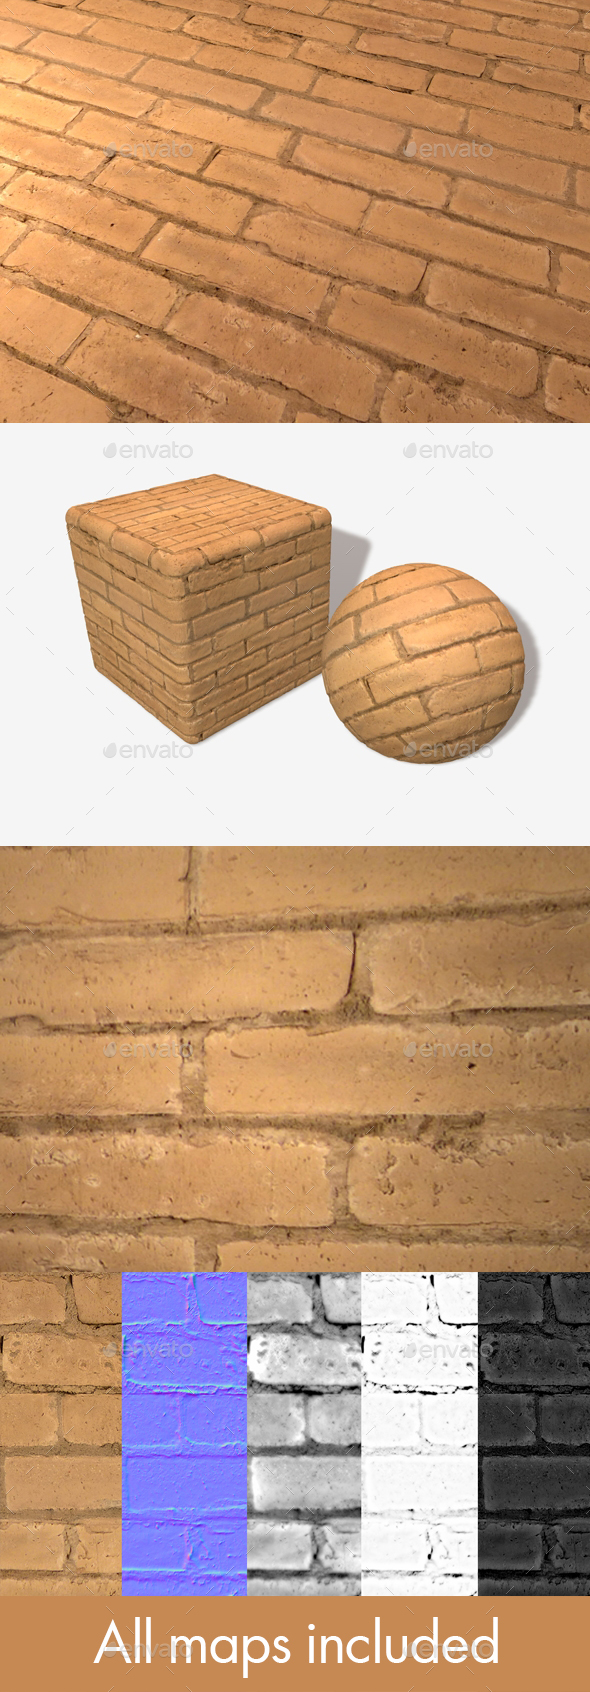 Painted Orange Bricks Seamless Texture - 3DOcean Item for Sale